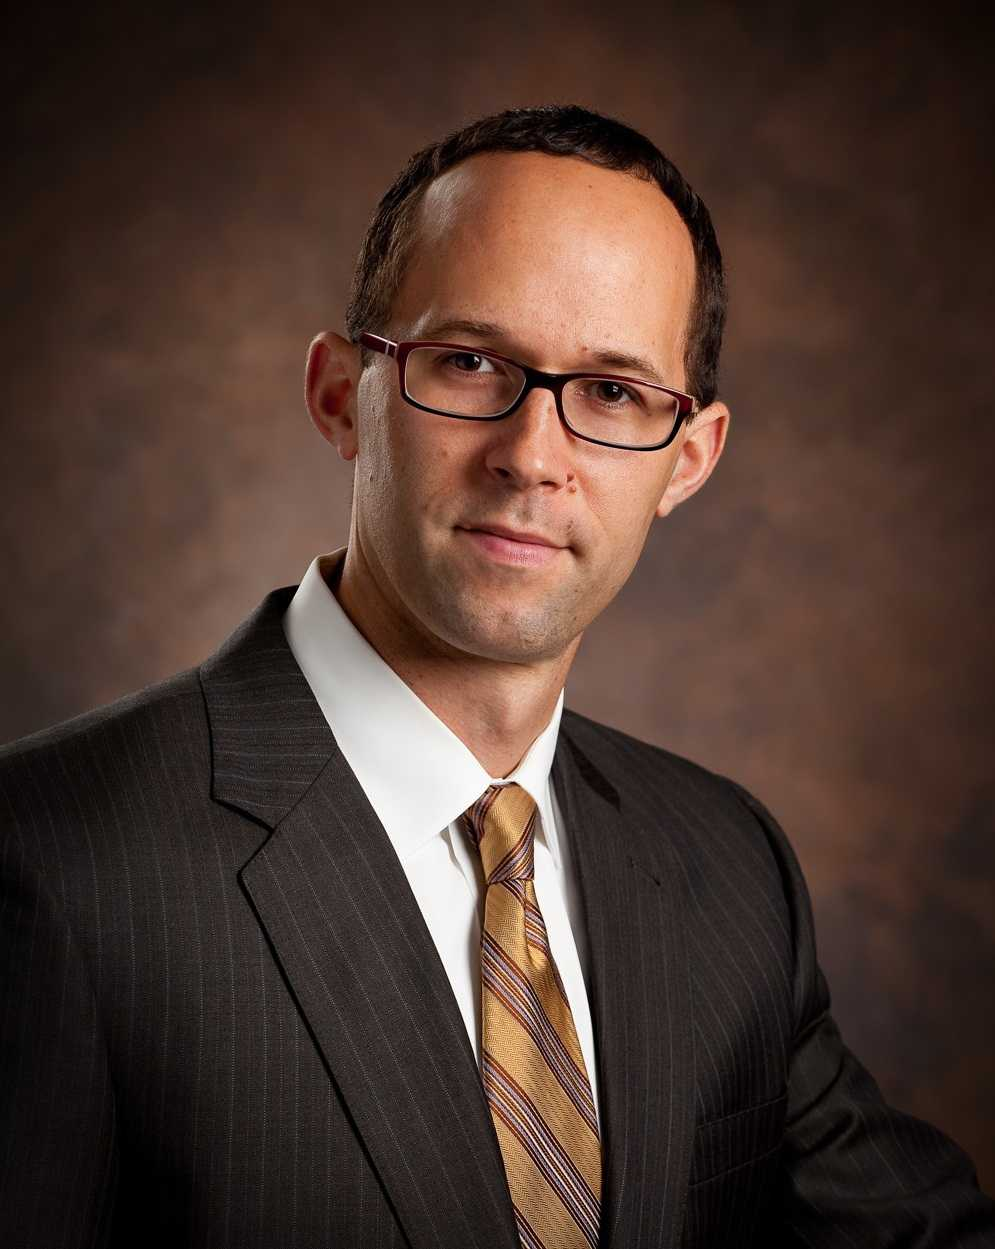 Jason B. Lattimore